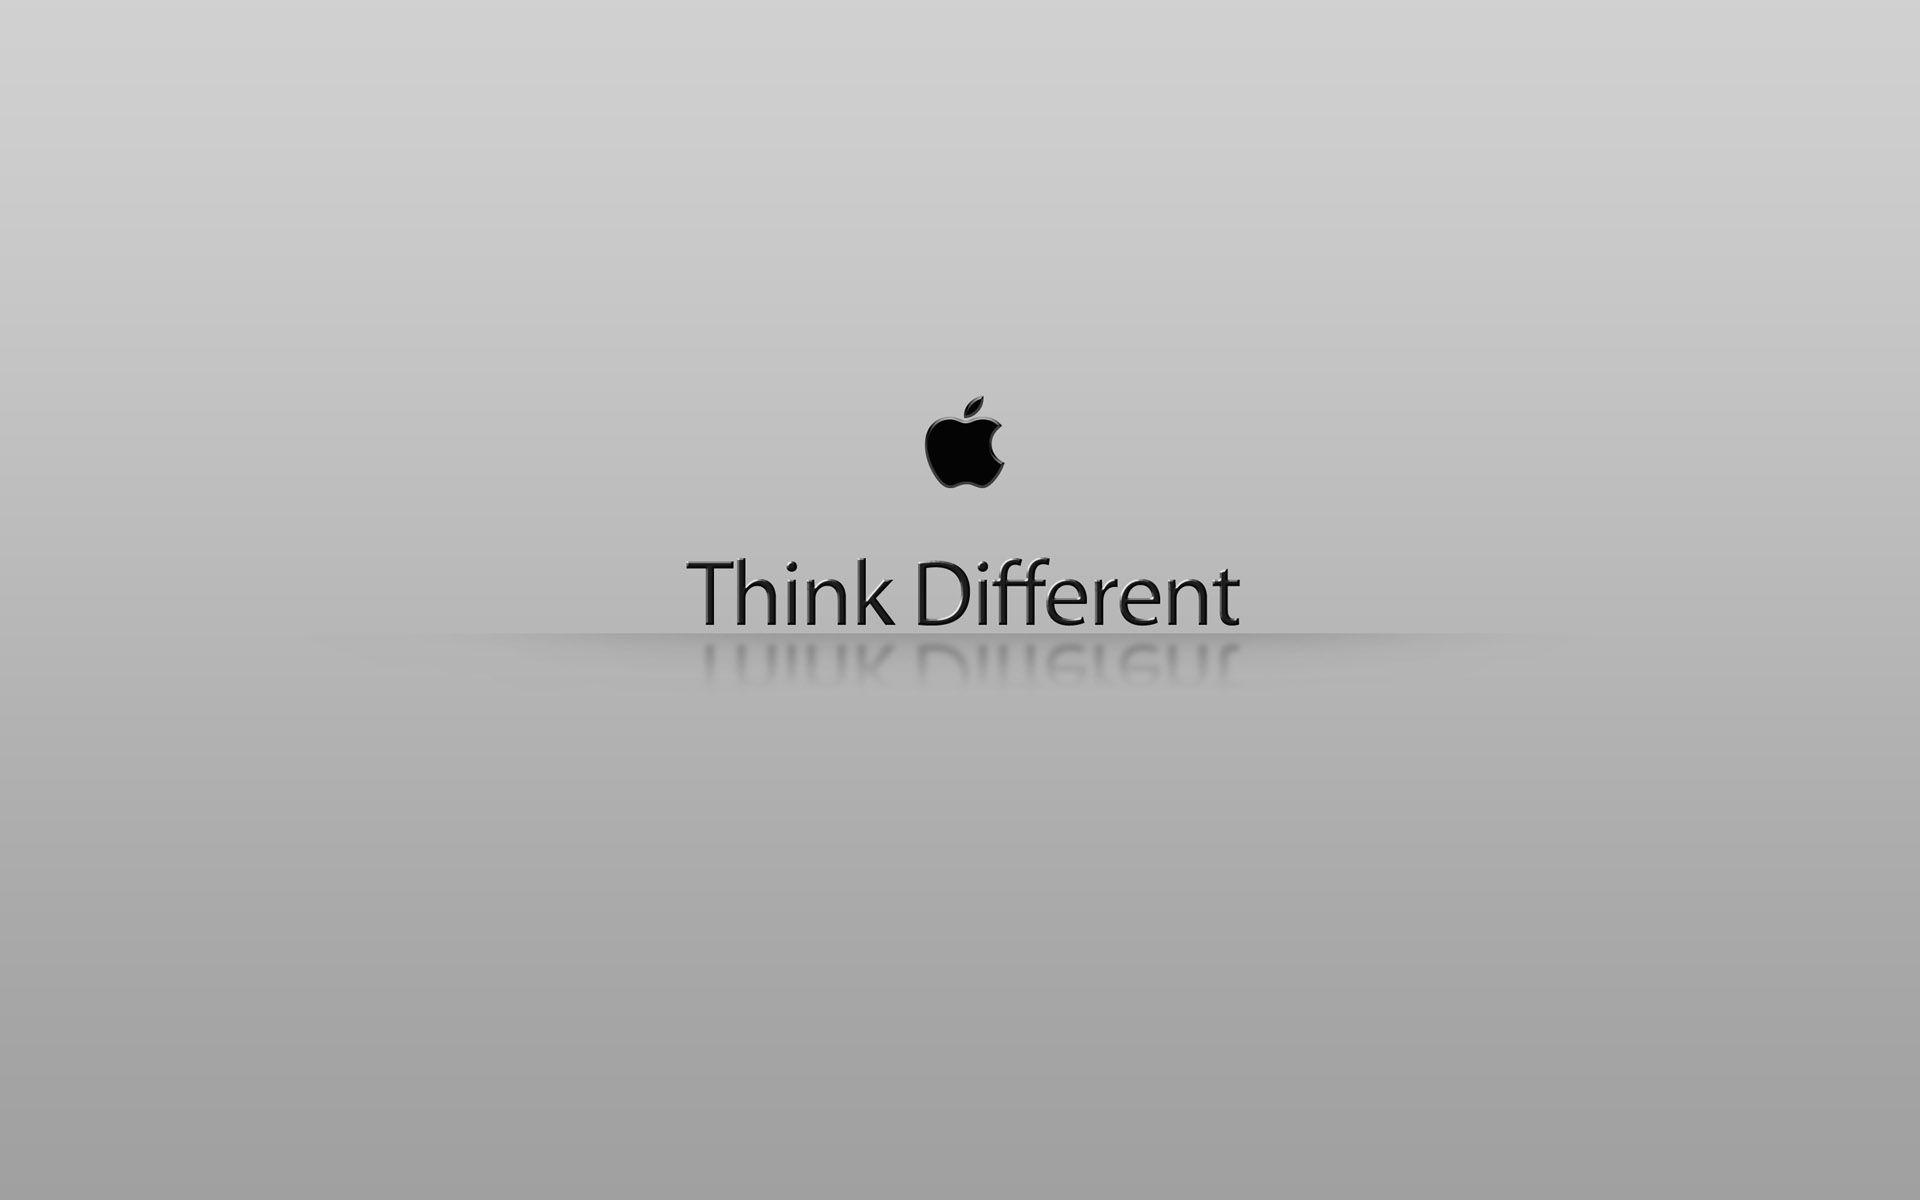 Think Different Apple Wallpaper Mac Wallpaper Desktop Mac Wallpaper